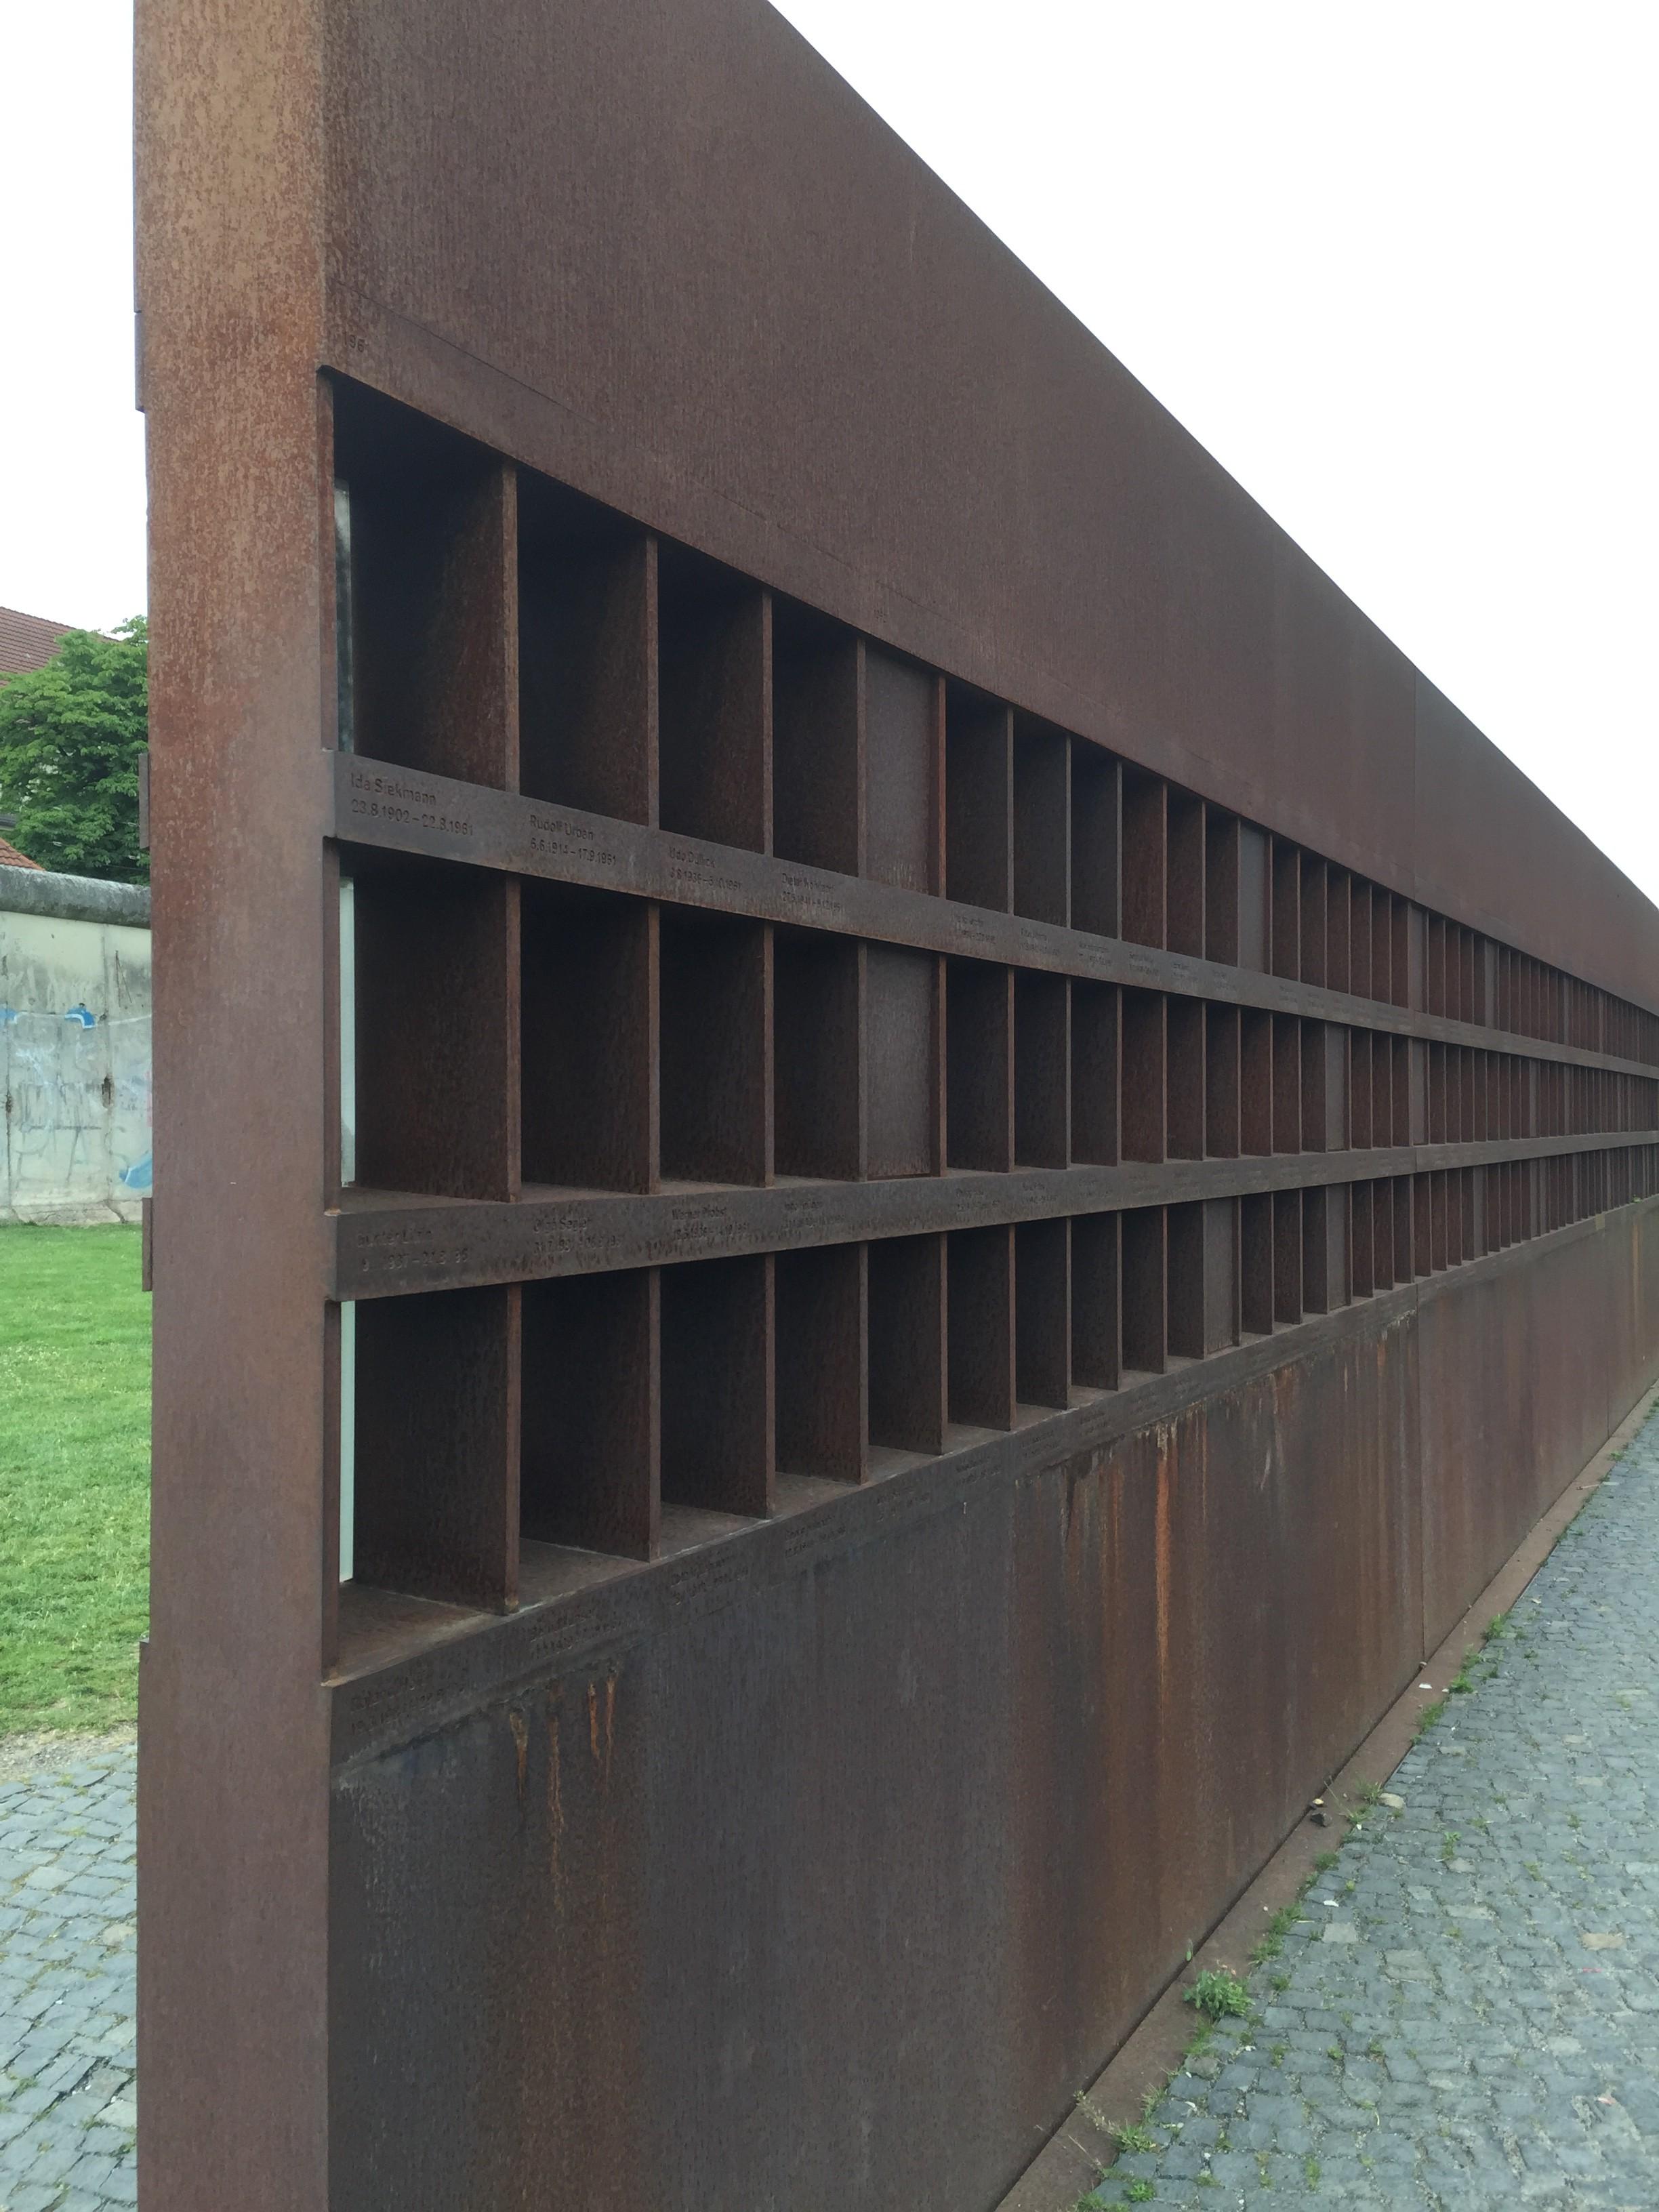 part of Berlin Wall Memorial